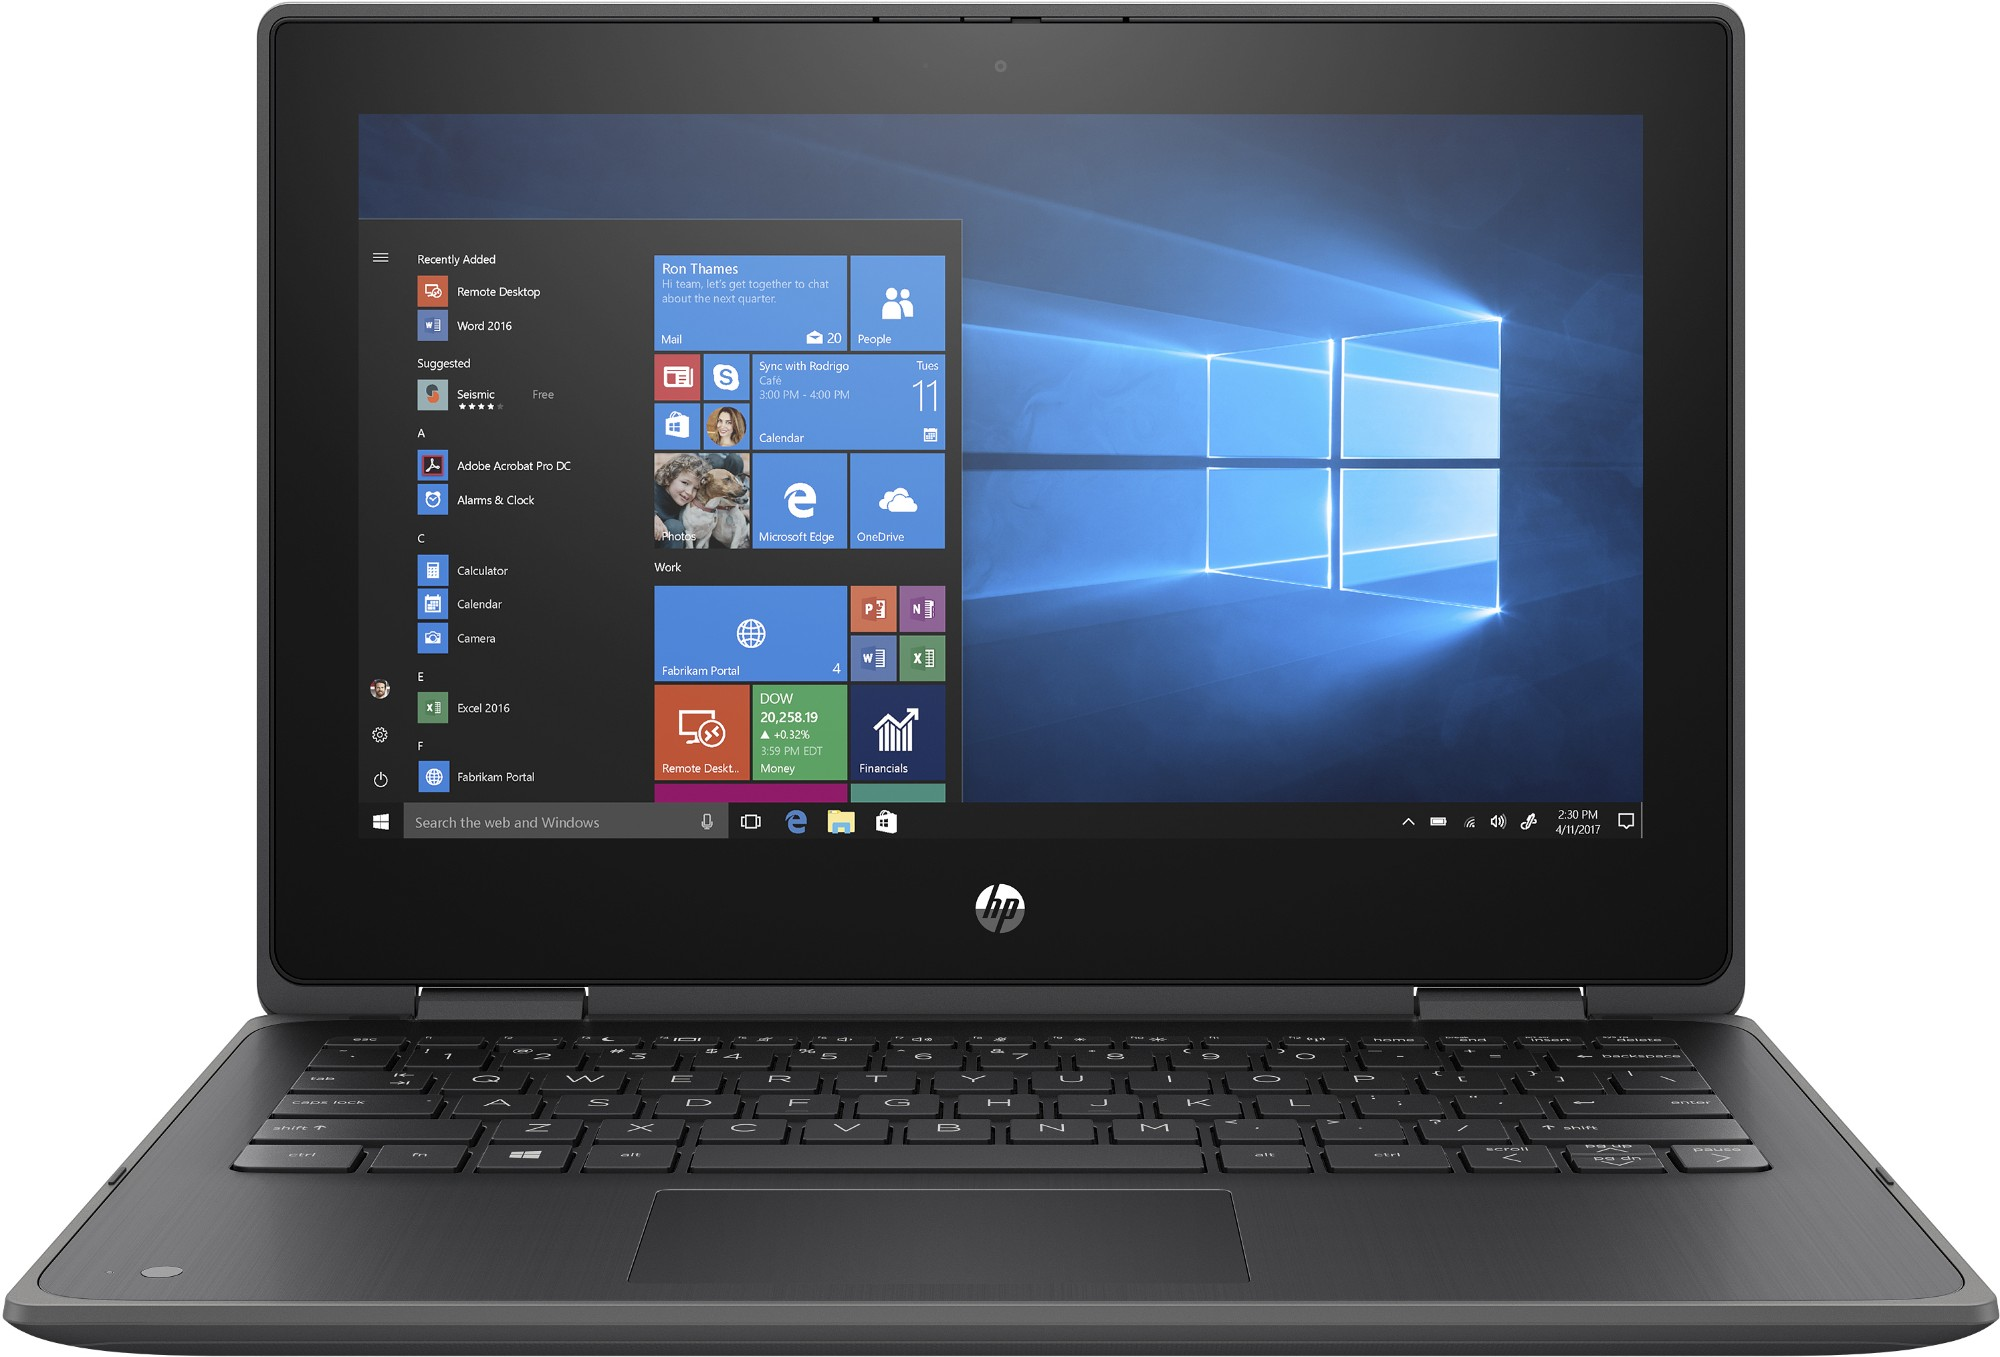 "HP ProBook x360 11 G5 EE Hybride (2-in-1) Zwart 29,5 cm (11.6"") 1366 x 768 Pixels Touchscreen Intel® Pentium® Silver 4 GB LPDDR4-SDRAM 128 GB SSD Wi-Fi 5 (802.11ac) Windows 10 Pro"